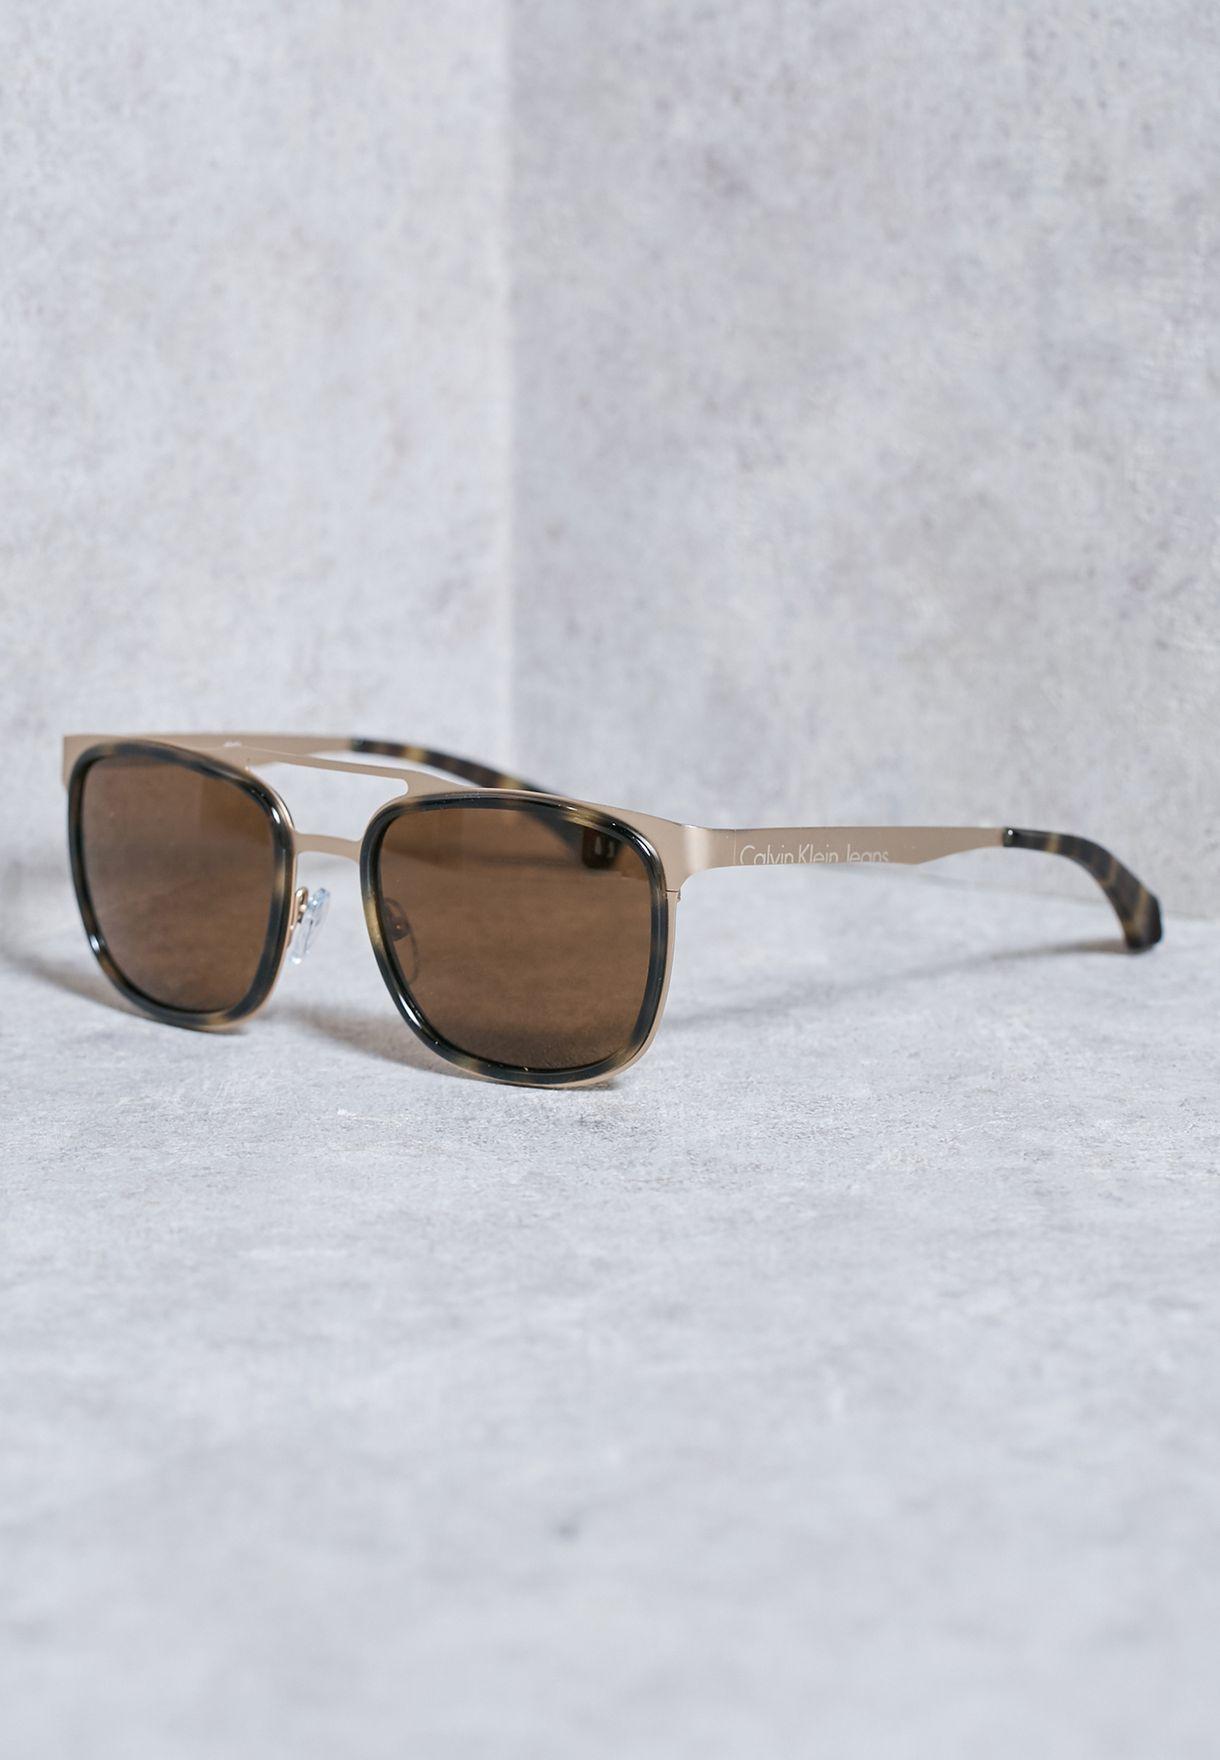 c48fe7a6f Shop Calvin Klein Jeans prints Metal Bridge Sunglasses CKJ136S-204 ...